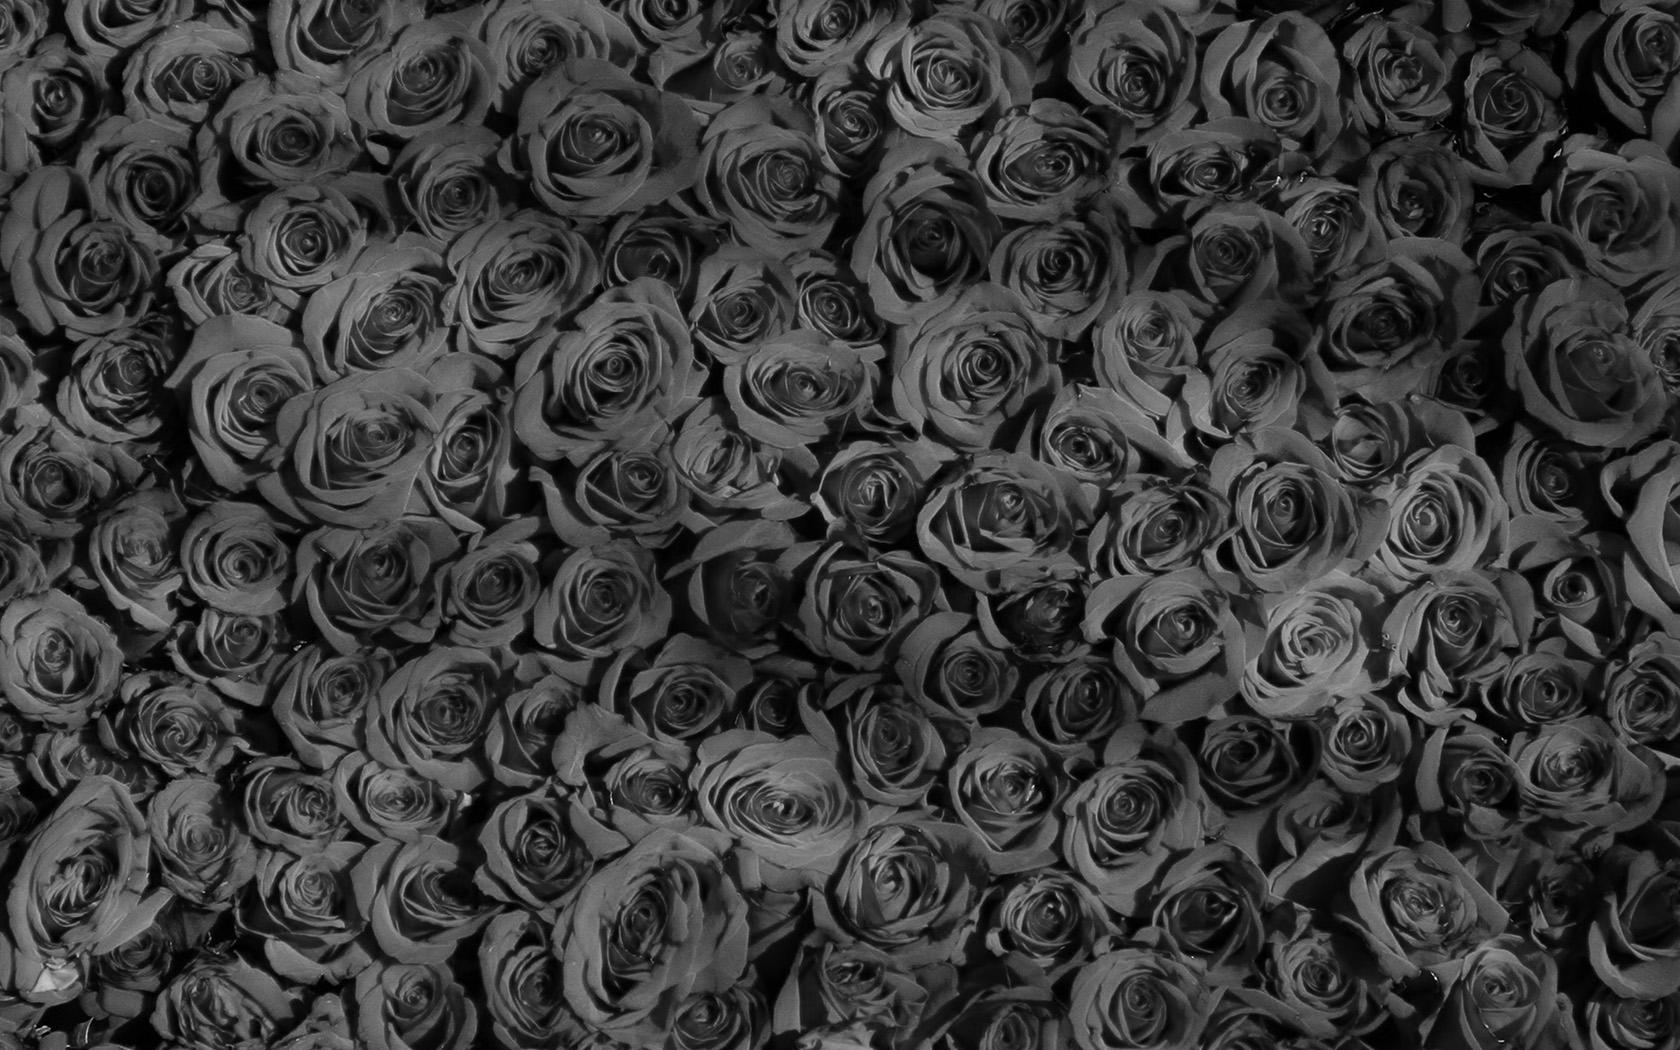 vo45-rose-dark-bw-pattern-wallpaper